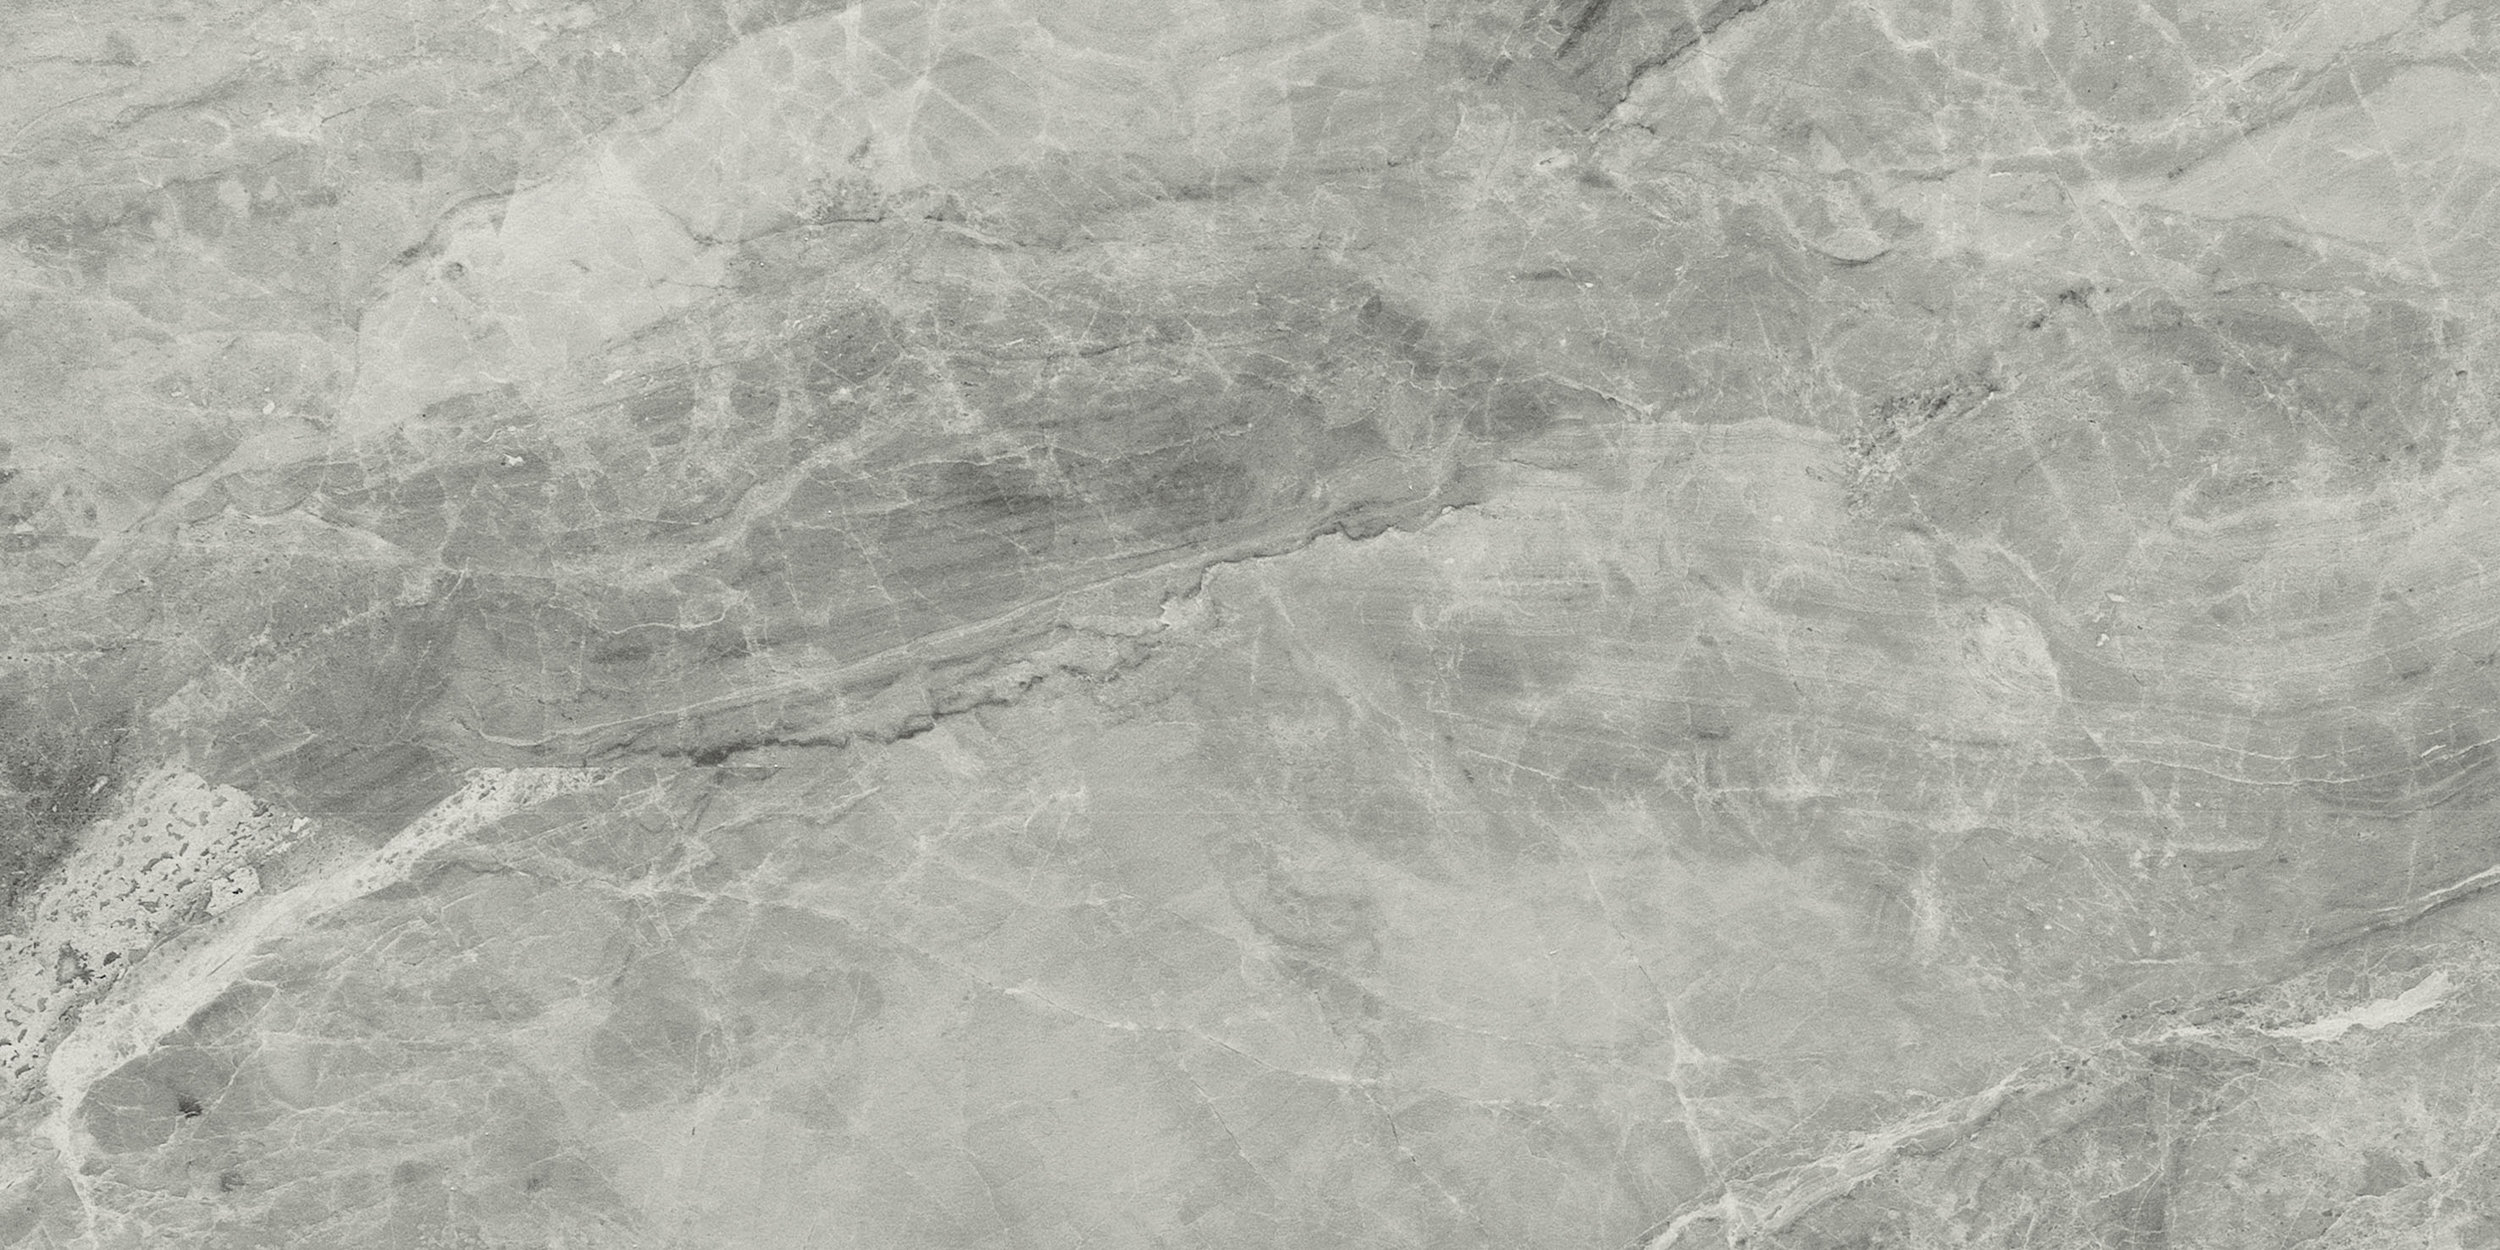 OROBICO GREY   SIZES AVAILABLE:  20x120, 20x160, 30x60, 60x60, 60x120, 80x80, 80x160, 120x120, 120x260, 160x320